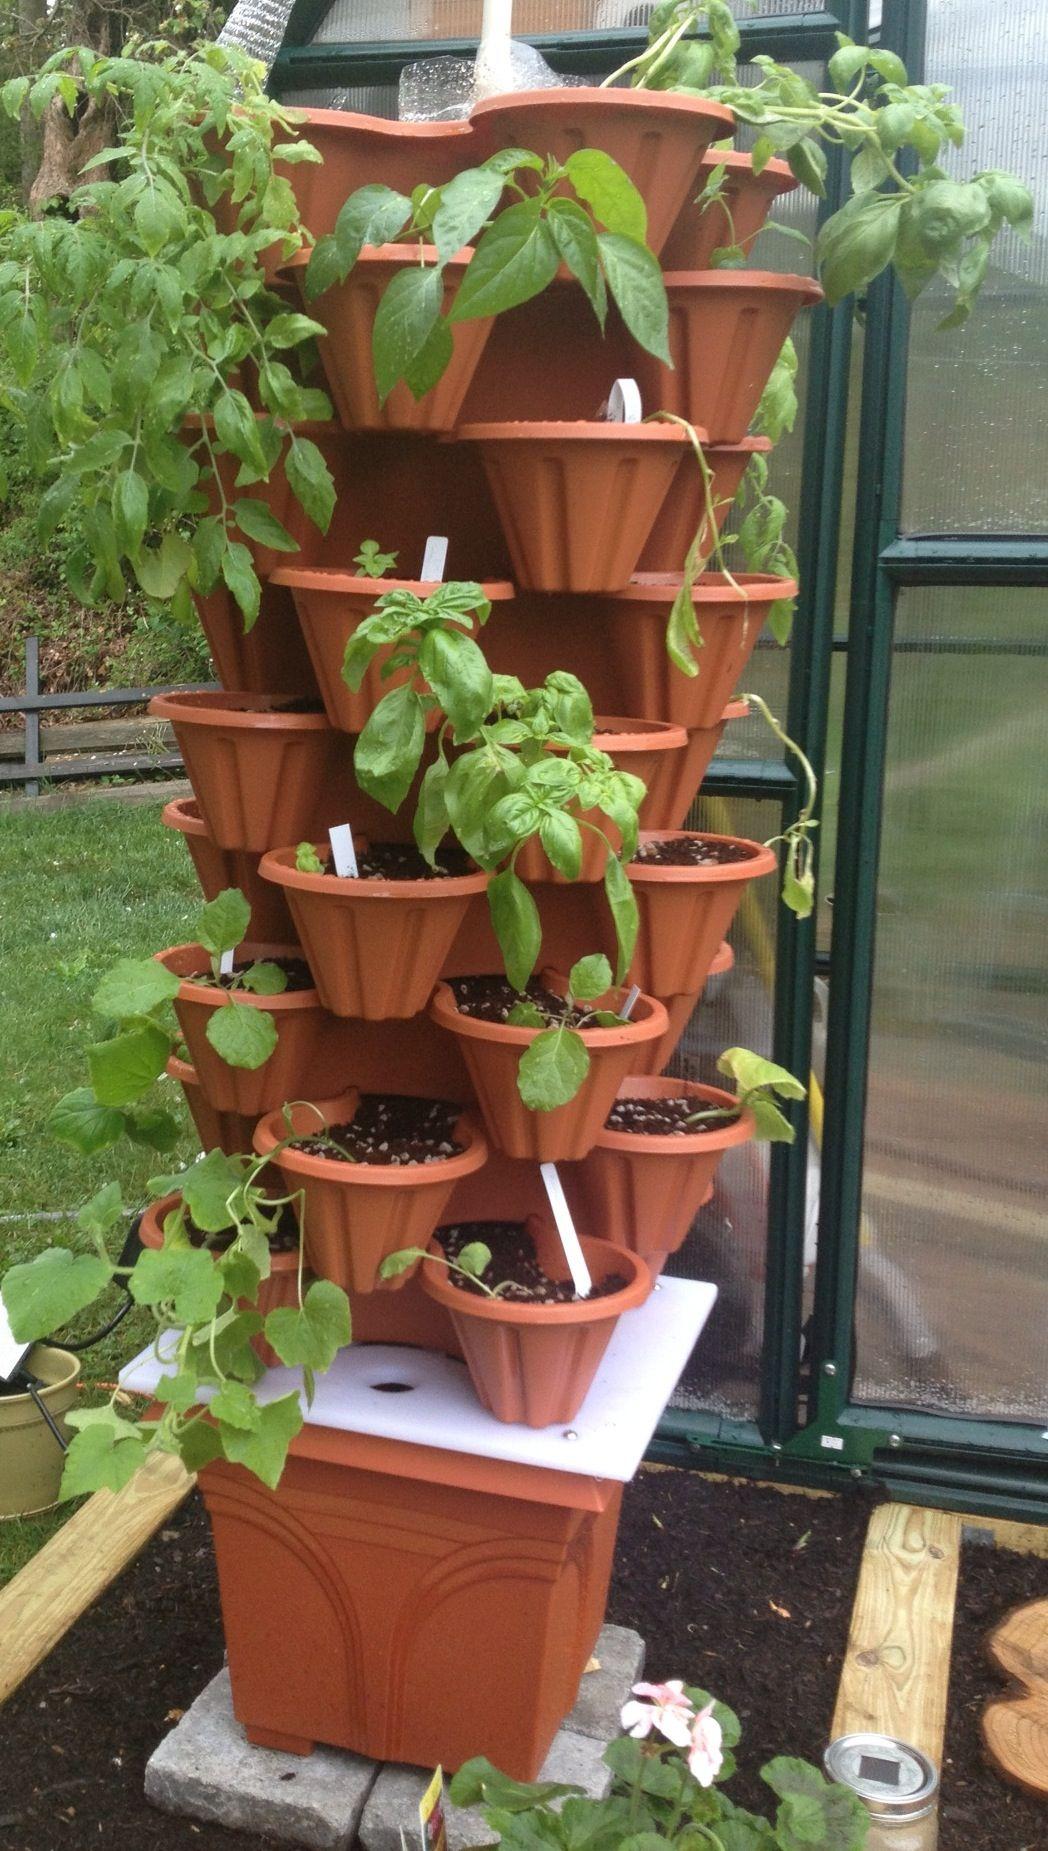 Homemade hydroponic tower | ✌ Herbs & Garden | Pinterest ...